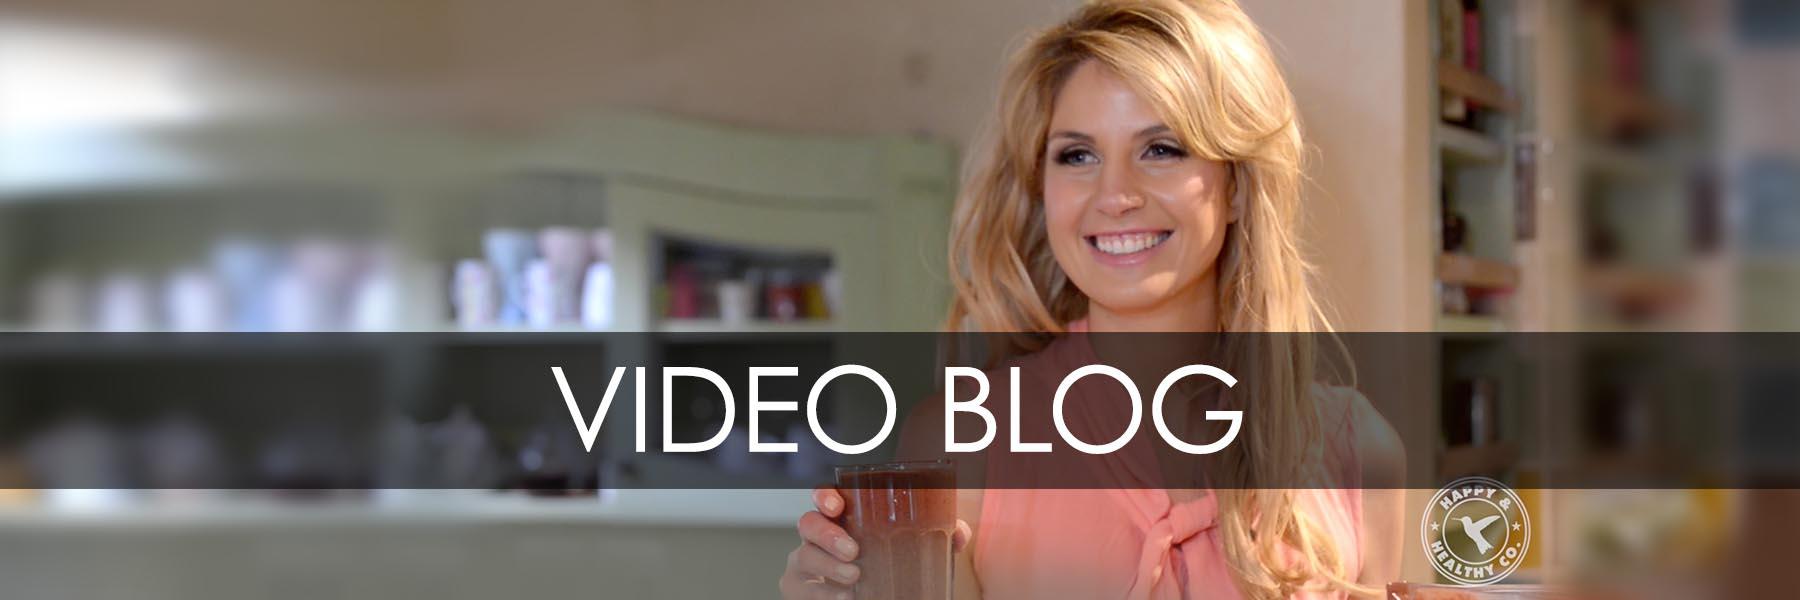 Adult video blog